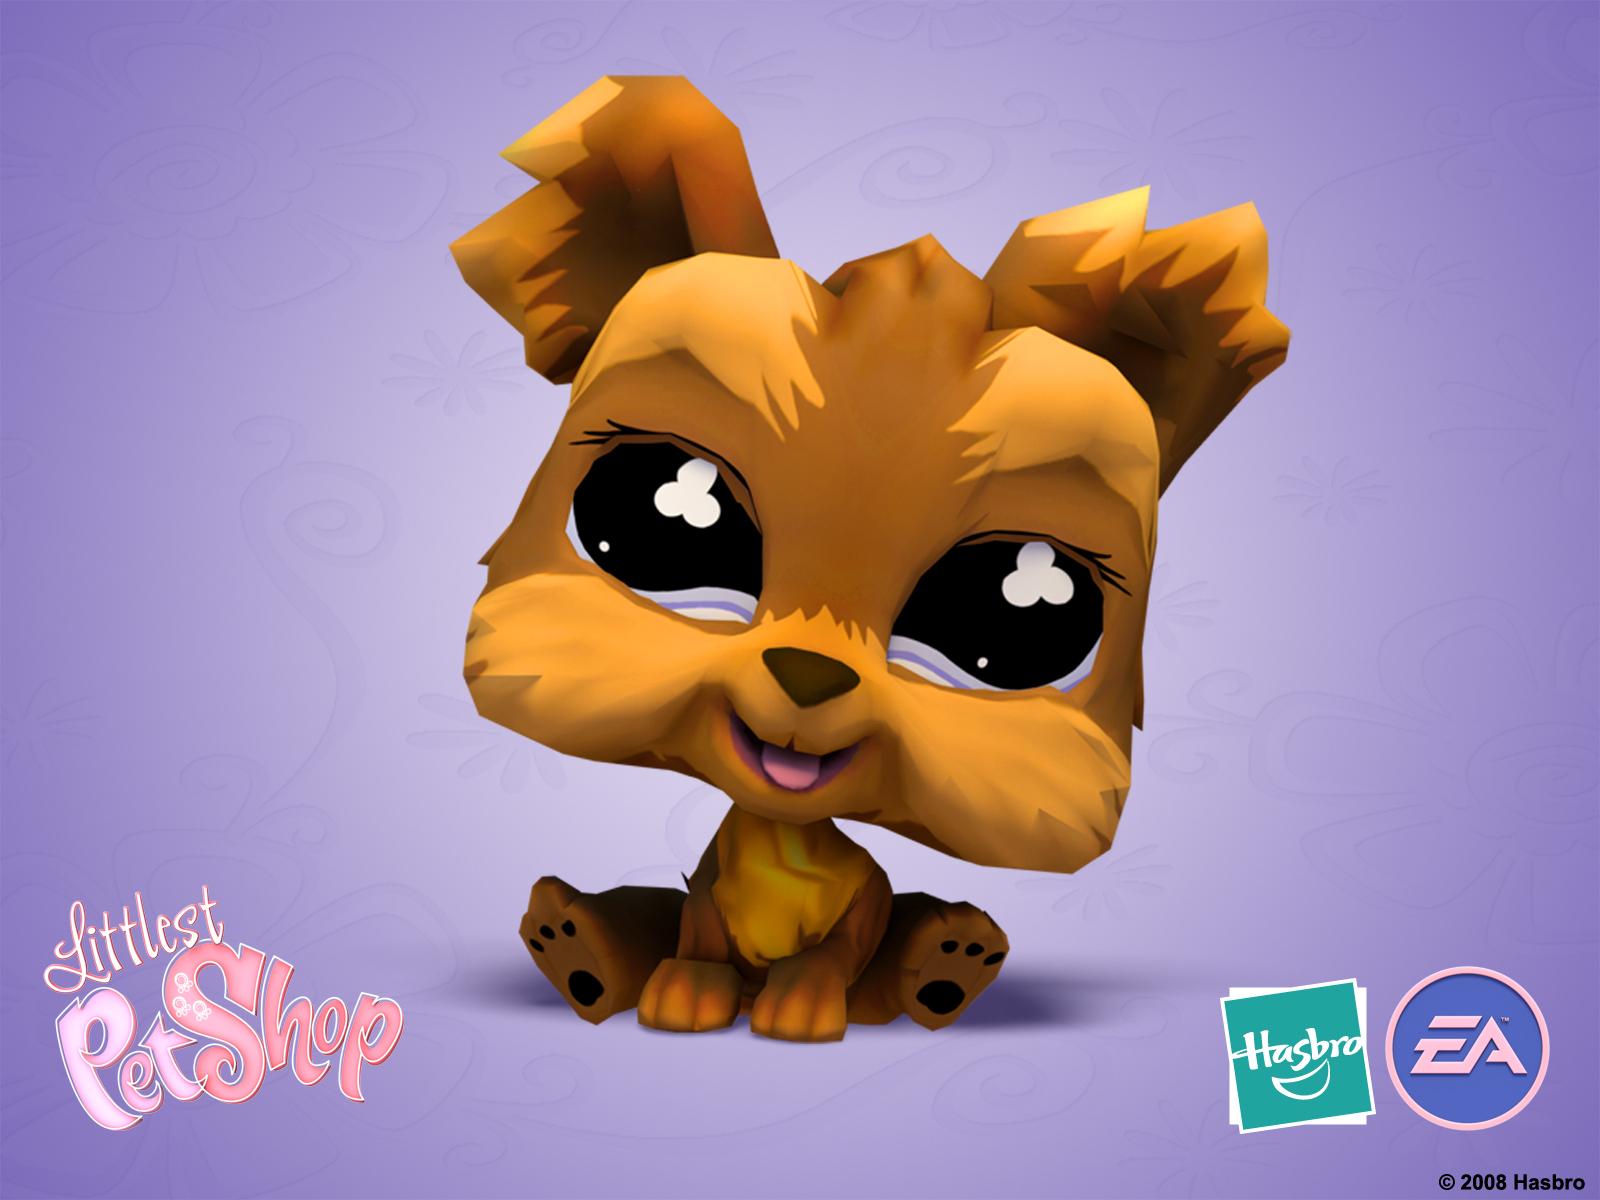 LPS EA Wallpaper littlest pet shop 4128853 1600 1200jpg 1600x1200